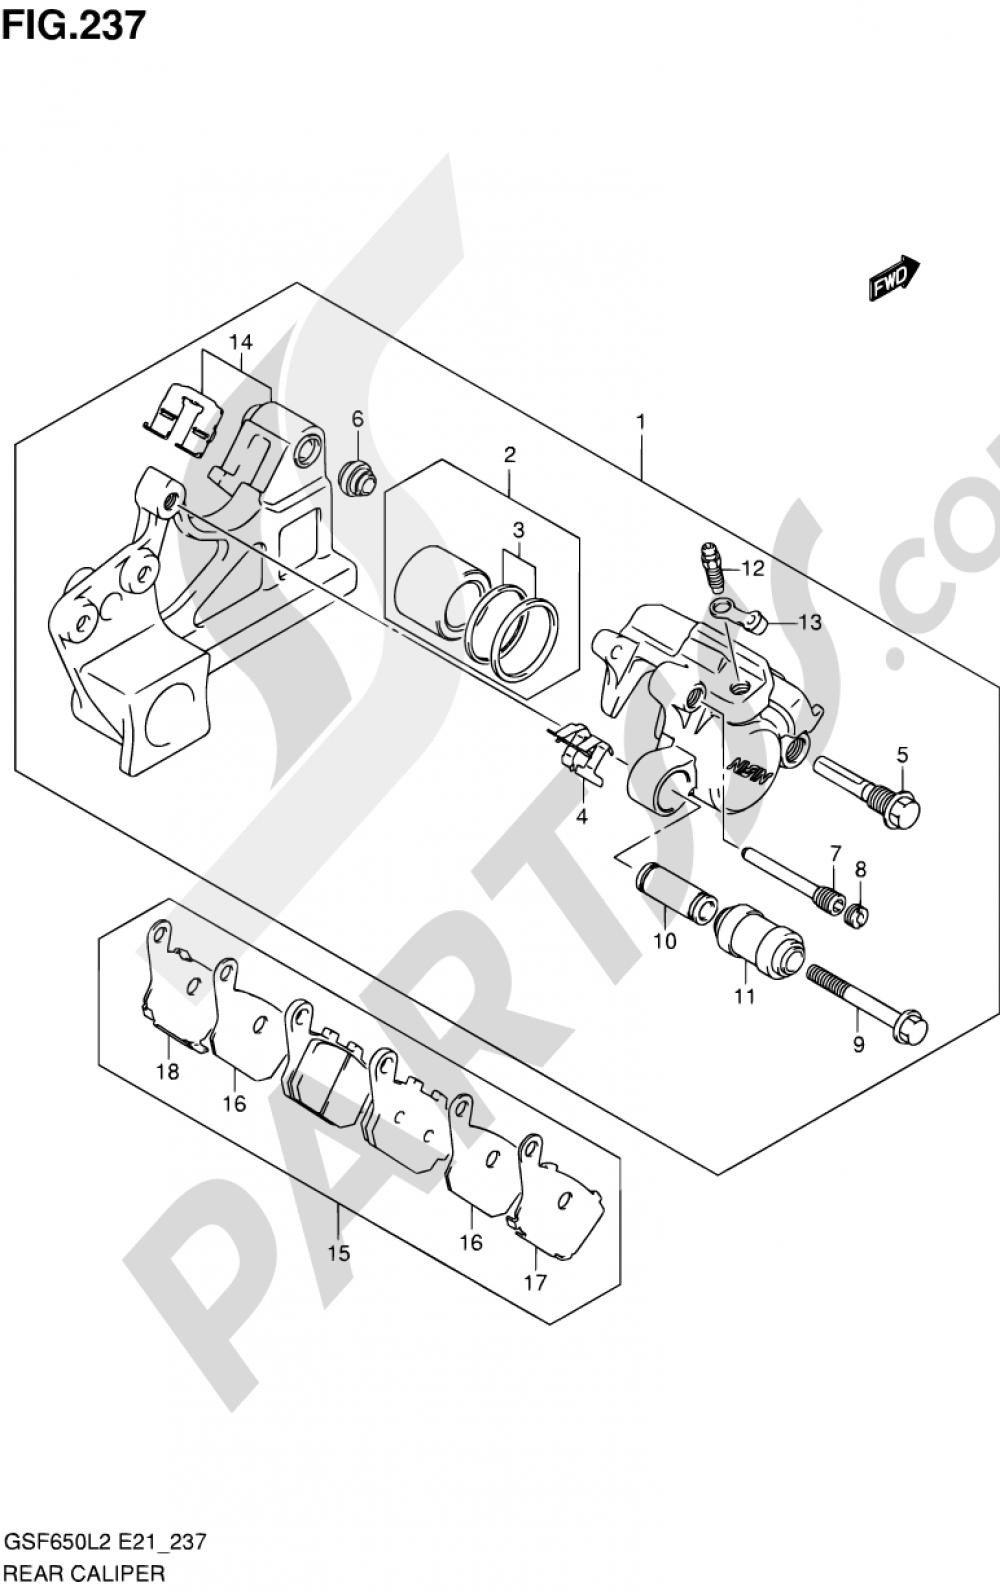 237 - REAR CALIPER (GSF650SAL2 E21) Suzuki BANDIT GSF650 2012